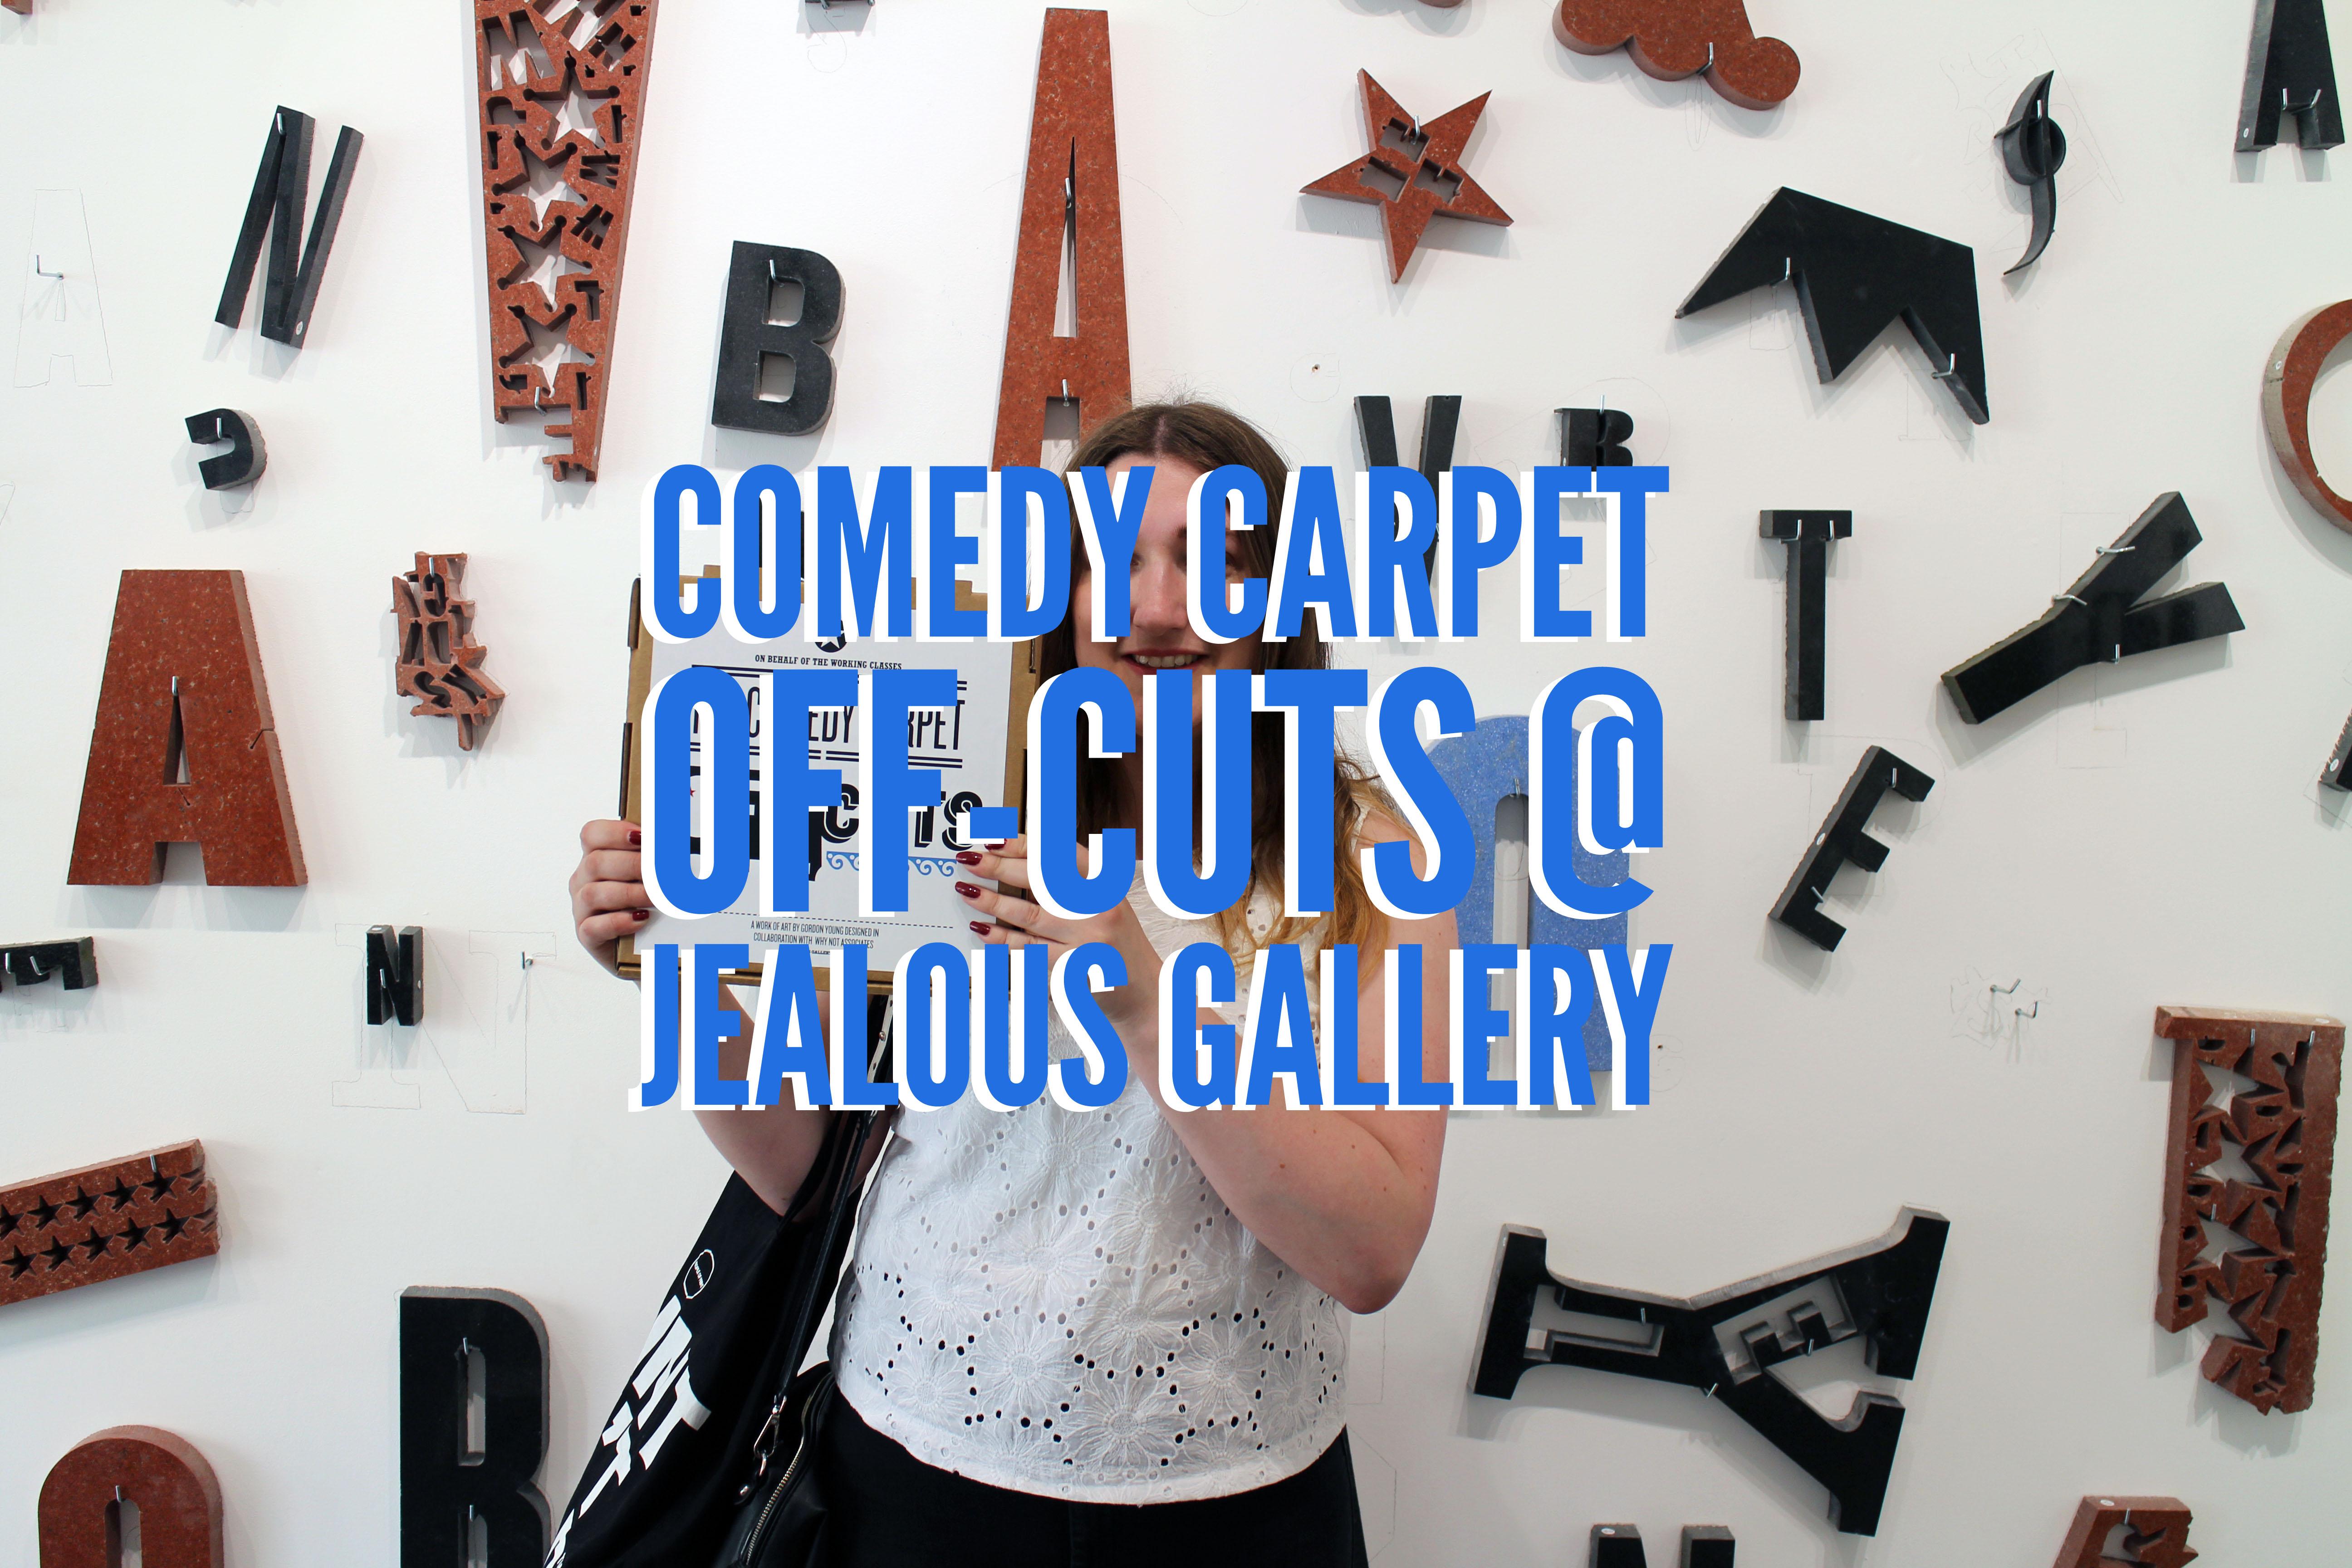 http://graphiquefantastique.com/wp-content/uploads/2015/05/ComedyCarpetOff-Cuts.jpg